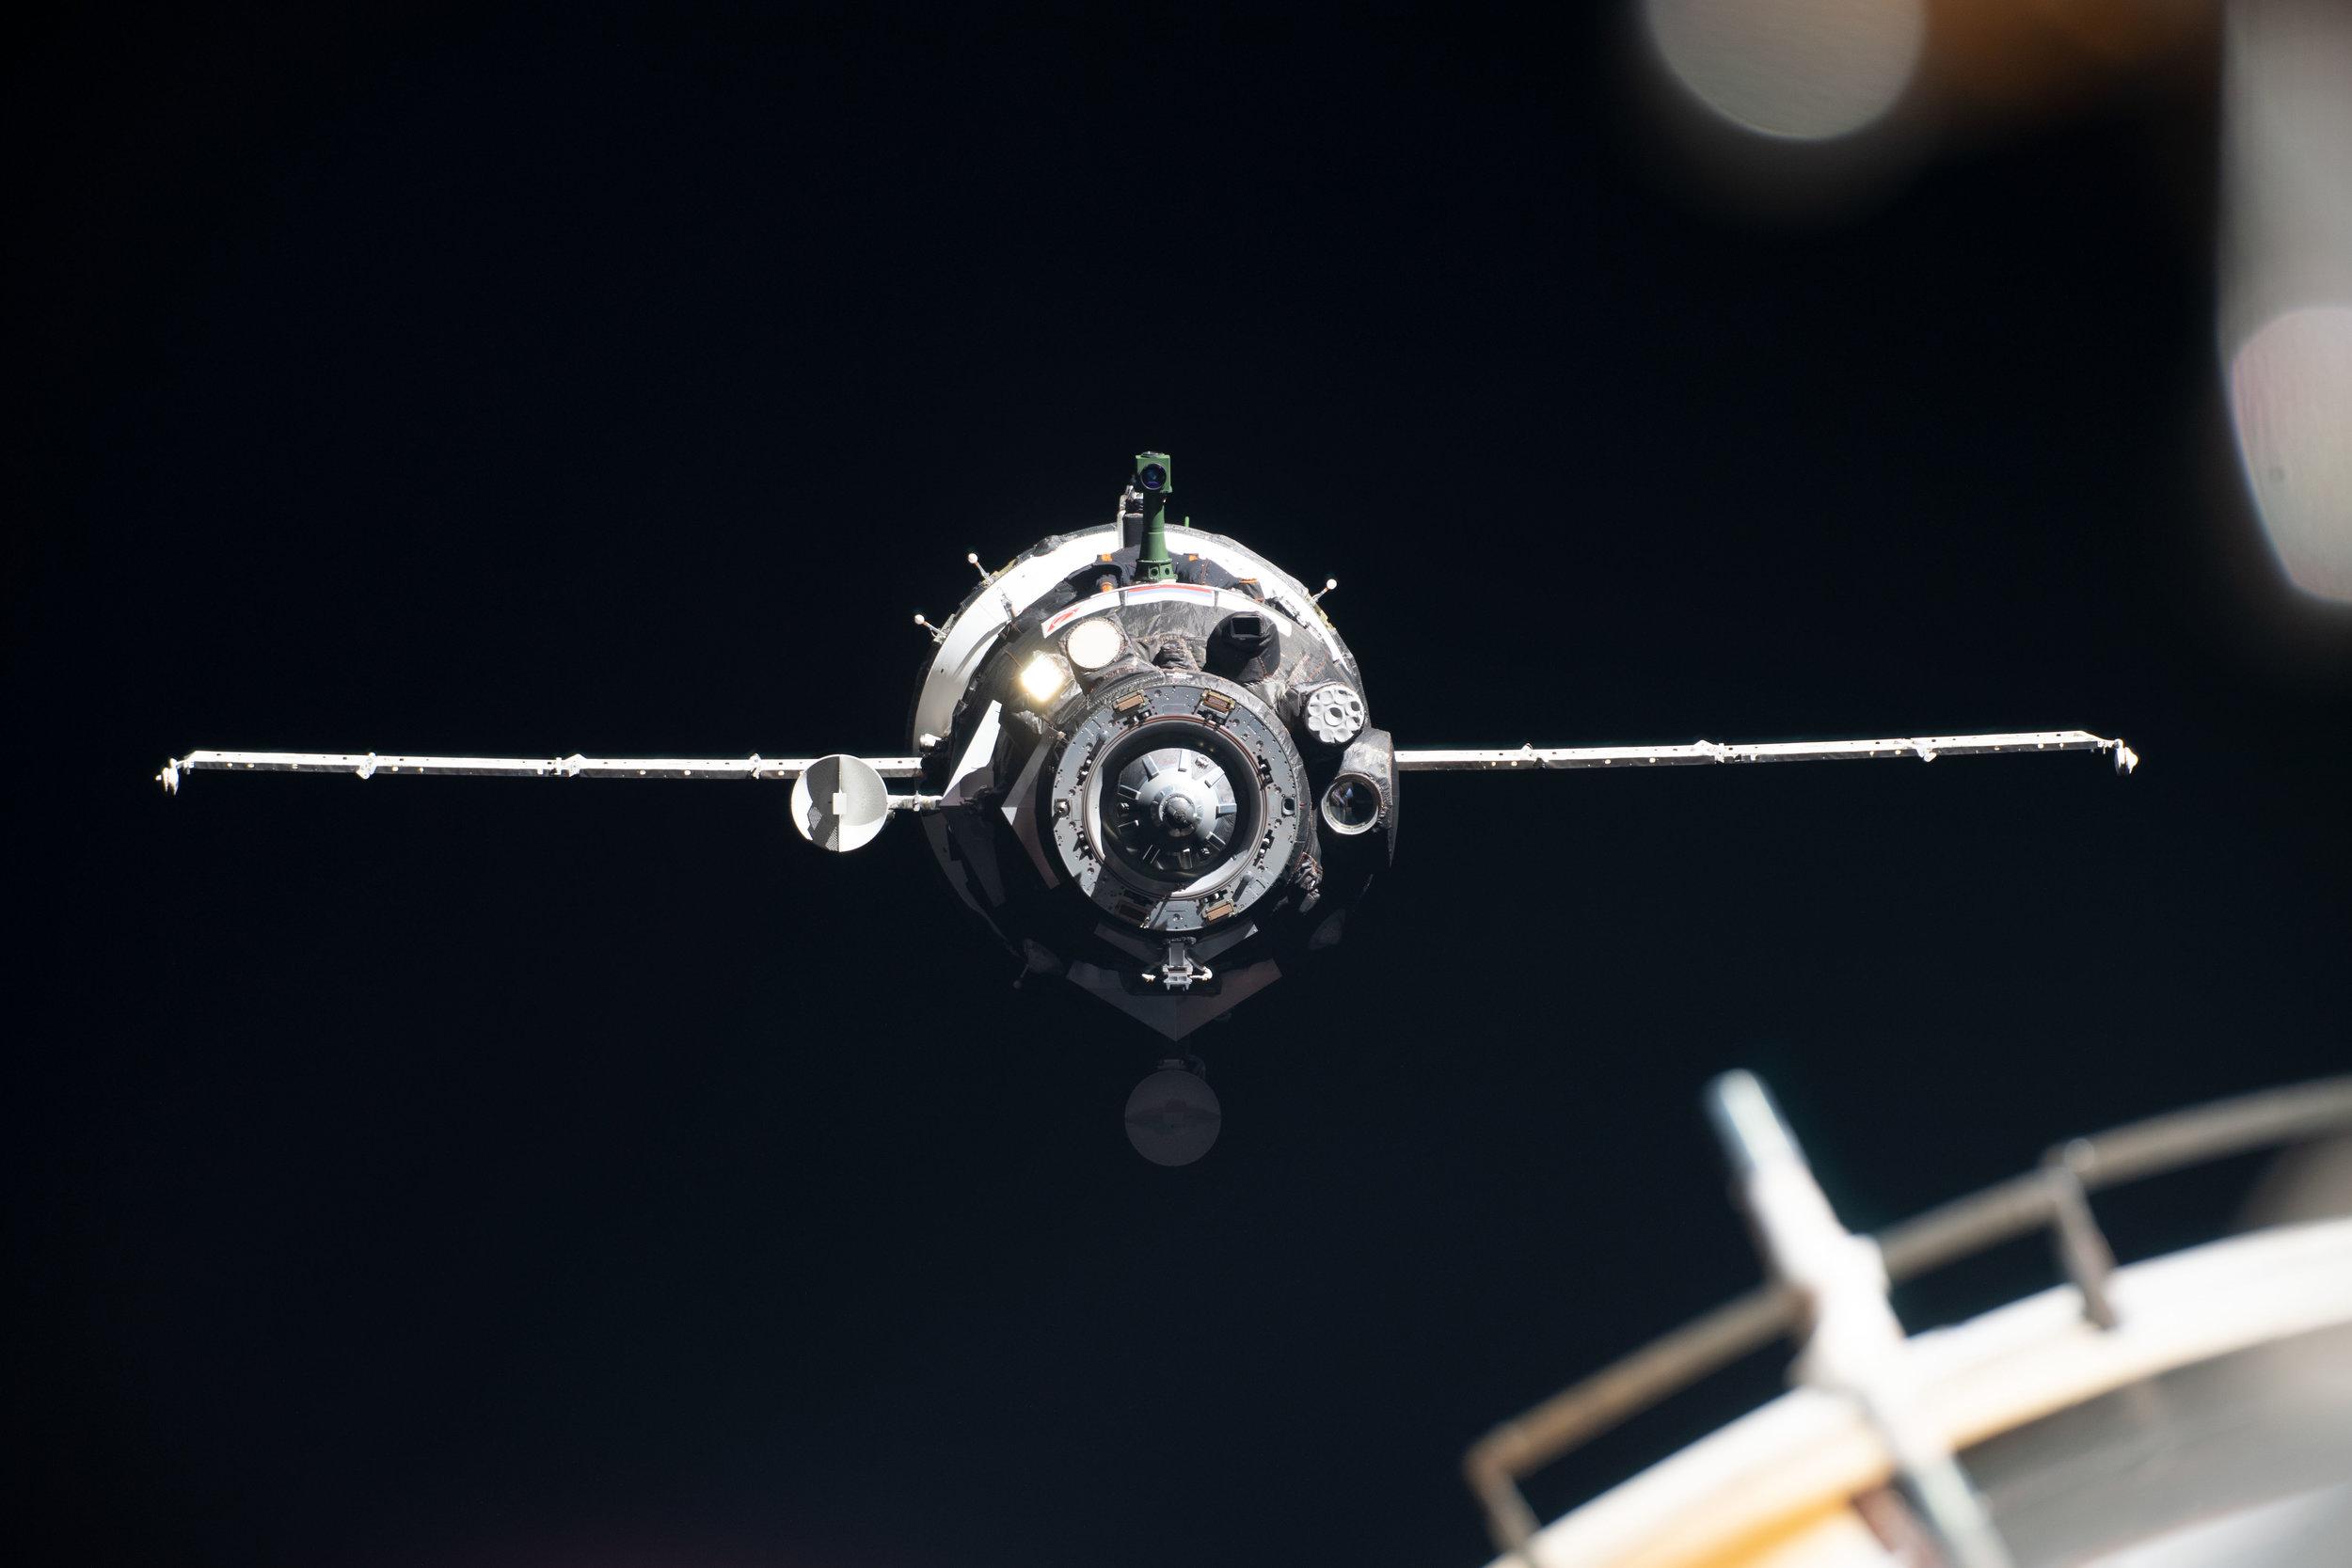 Soyuz MS-13 just before docking. Credit: NASA